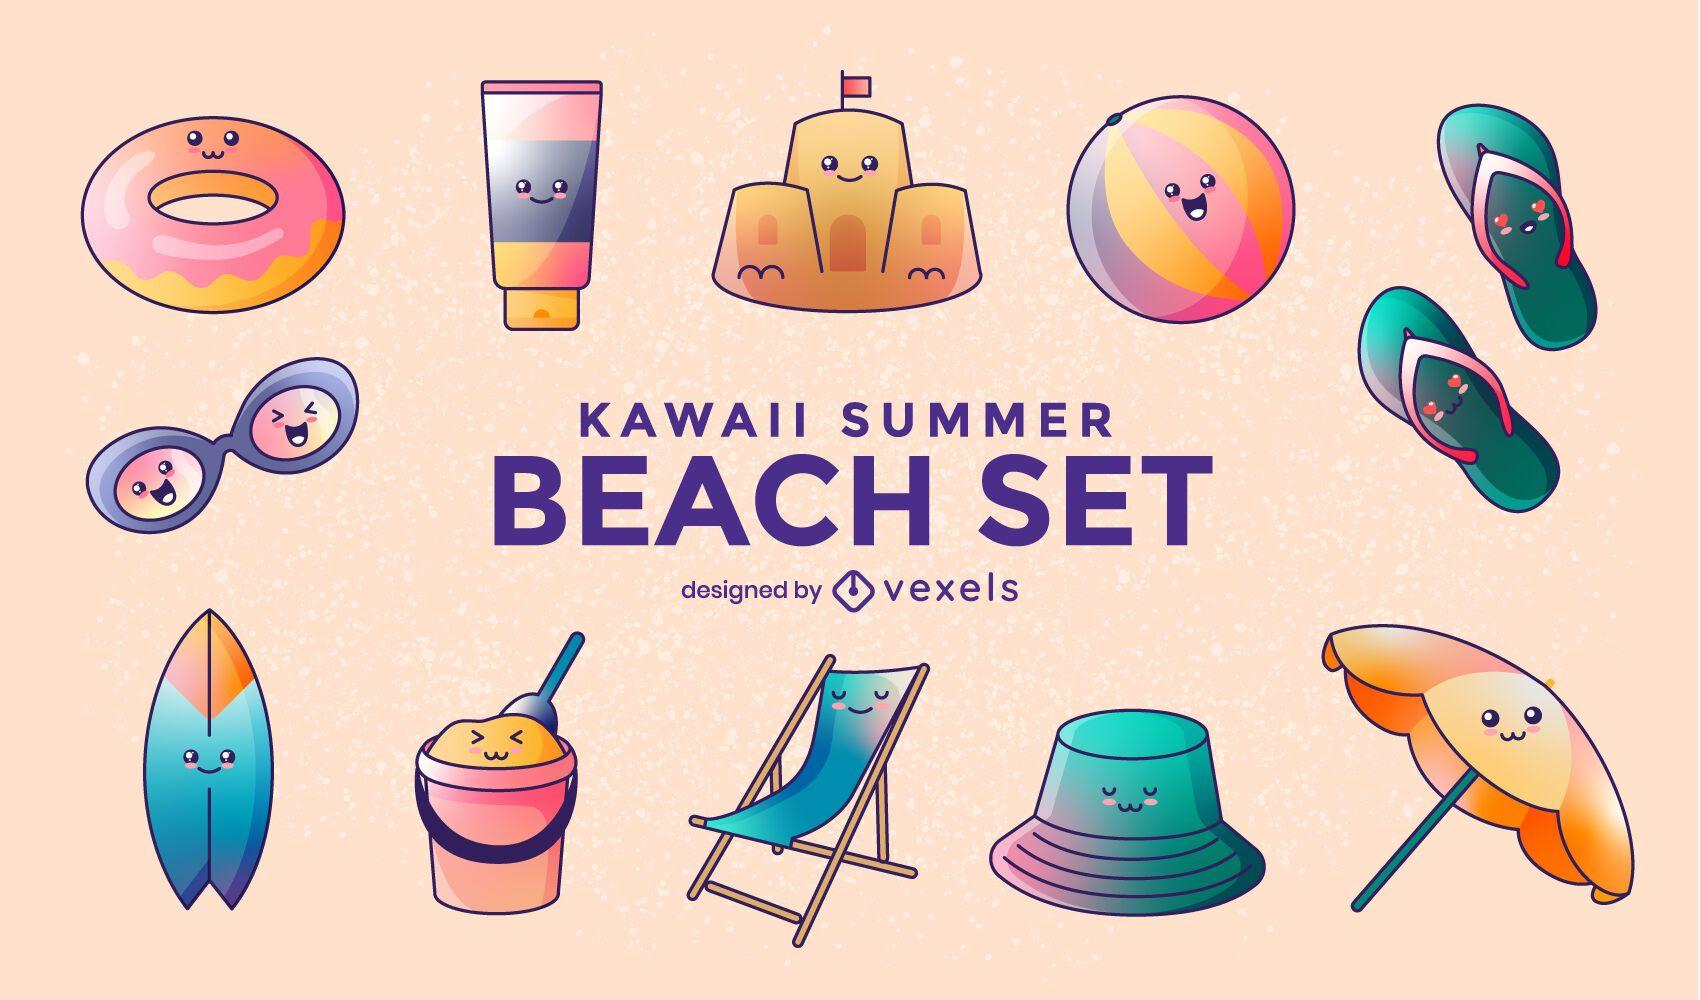 Set de playa de verano kawaii